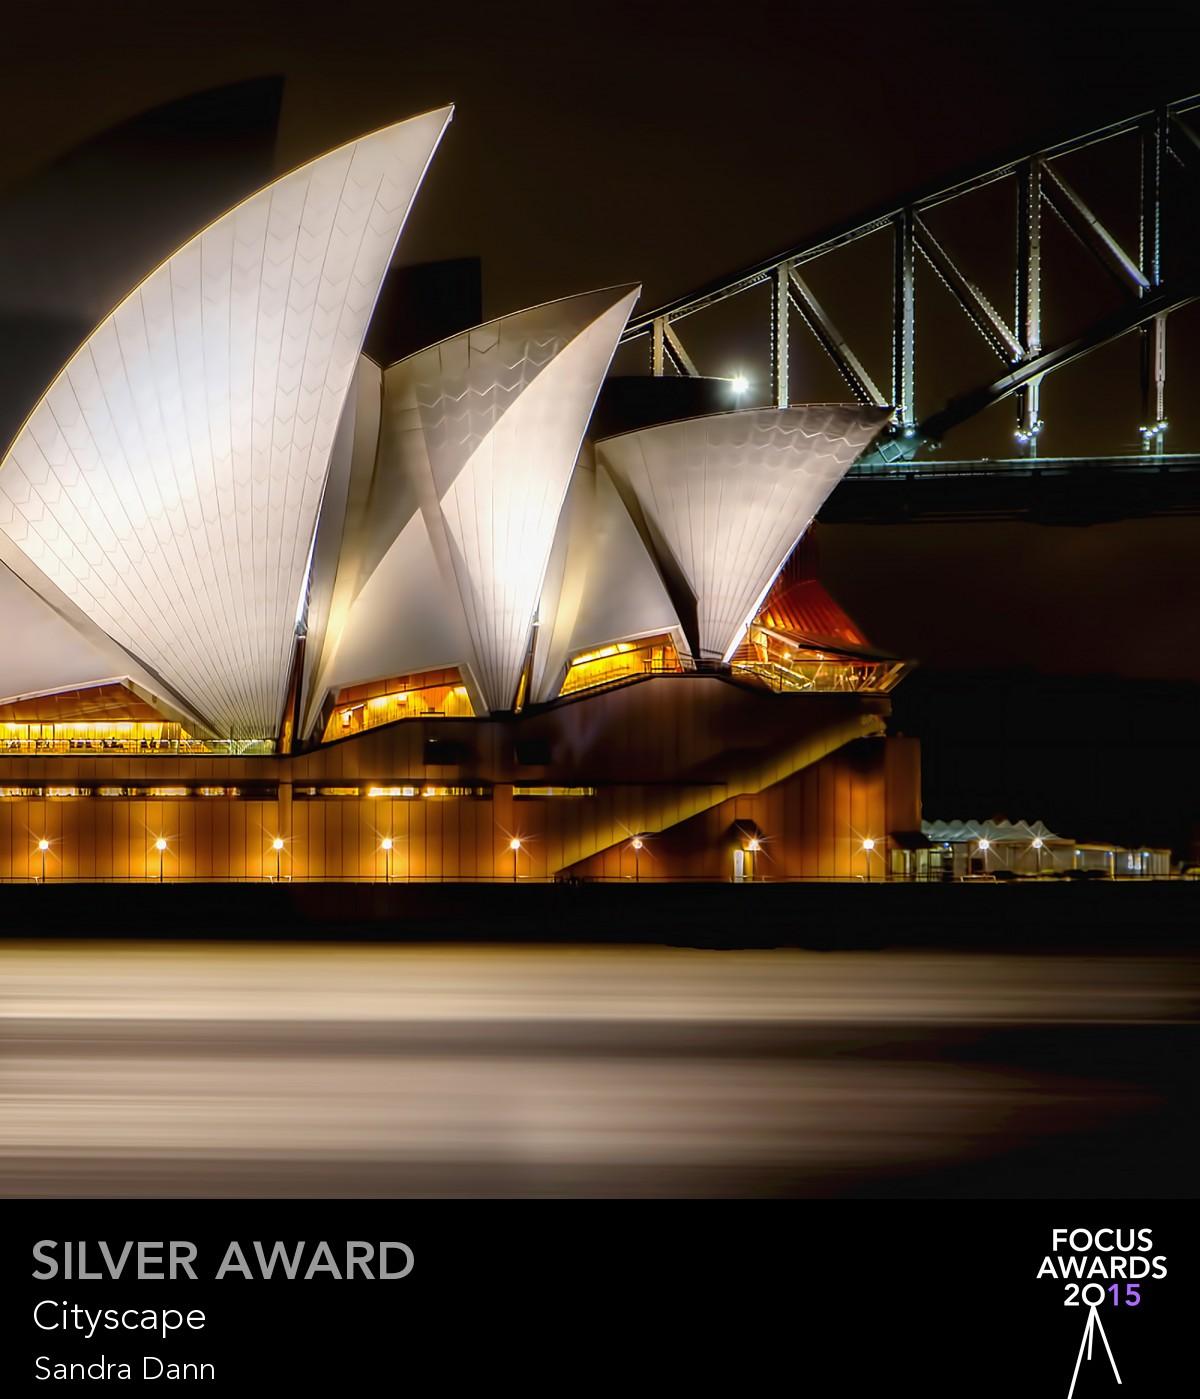 Silver award_1257_551354349.jpg